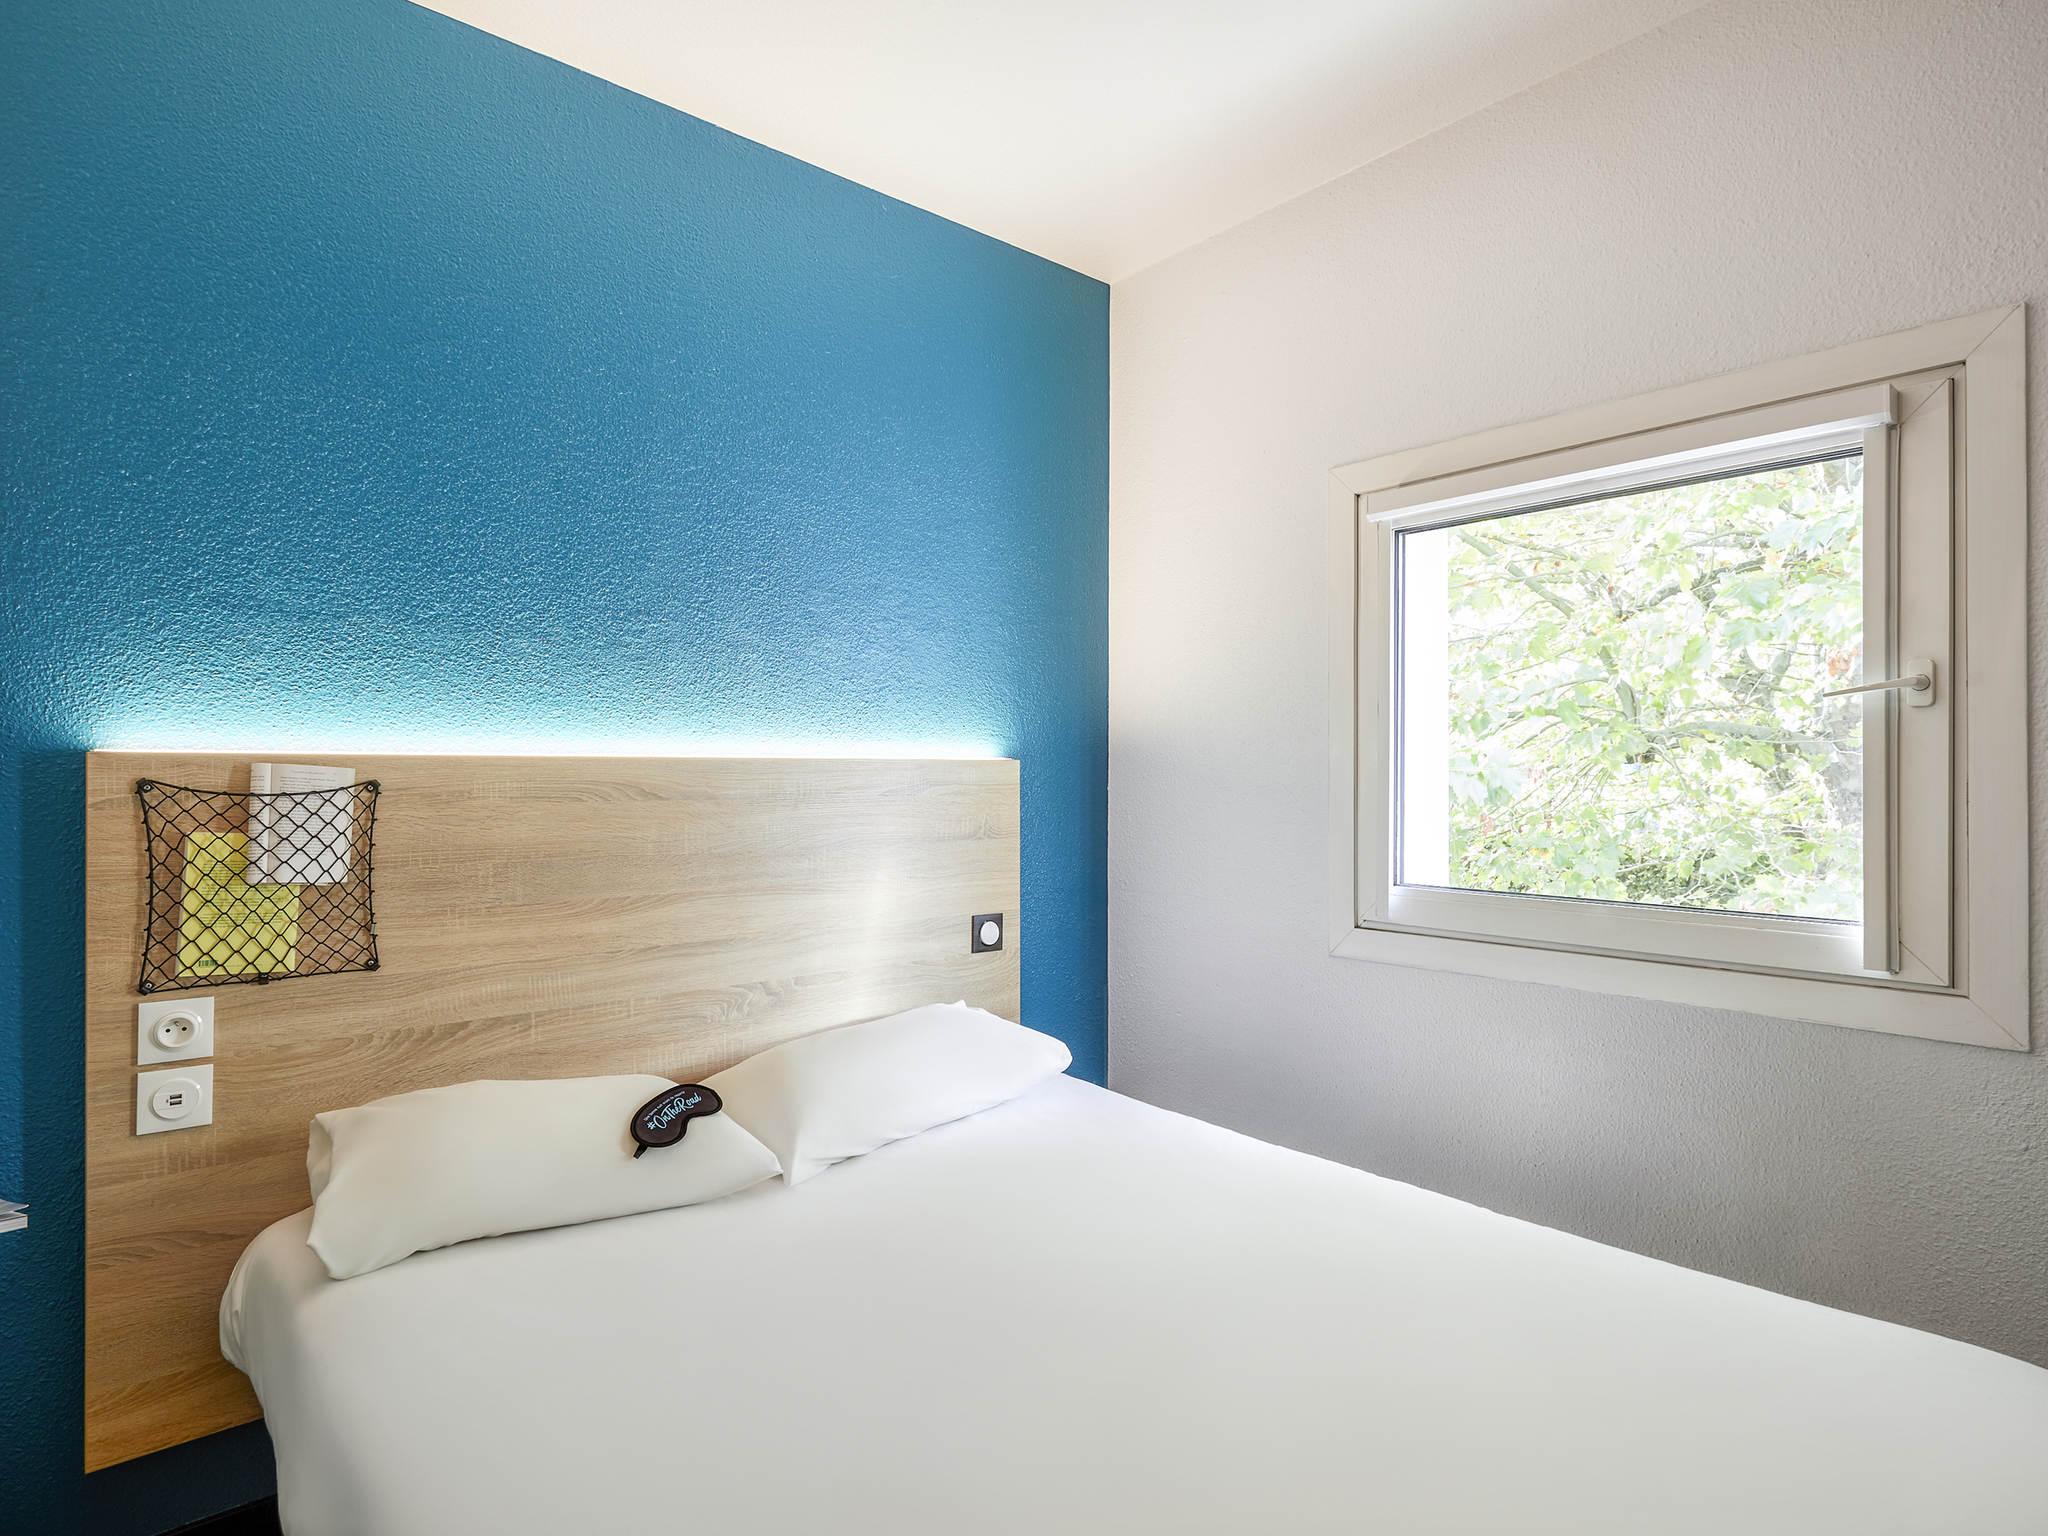 hotel in saint priest hotelf1 lyon saint priest. Black Bedroom Furniture Sets. Home Design Ideas